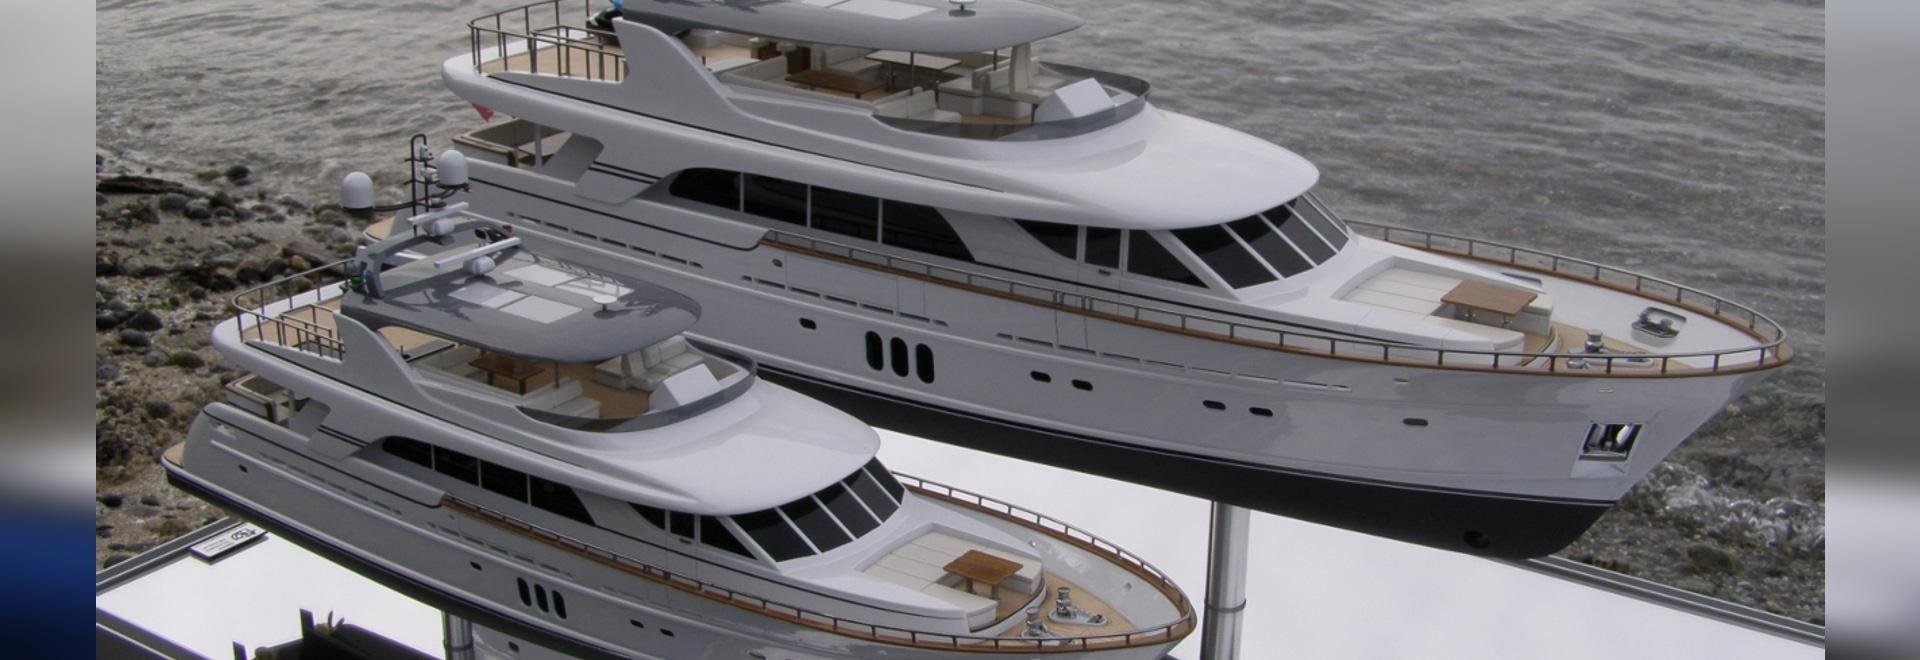 News: 30m Mahalo scale model